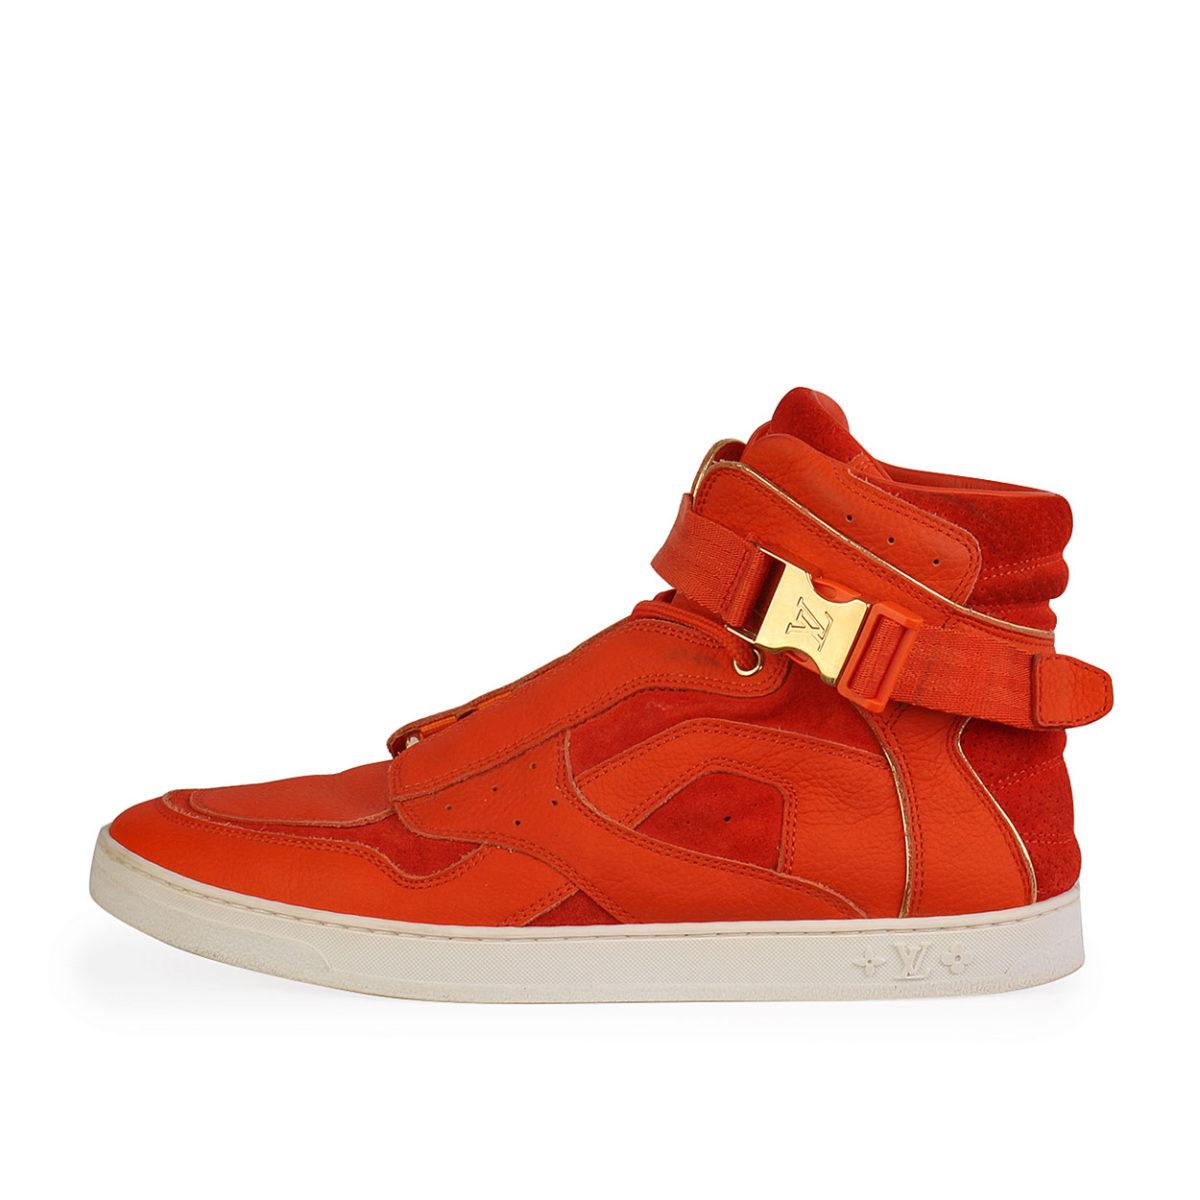 orange louis vuitton sneakers